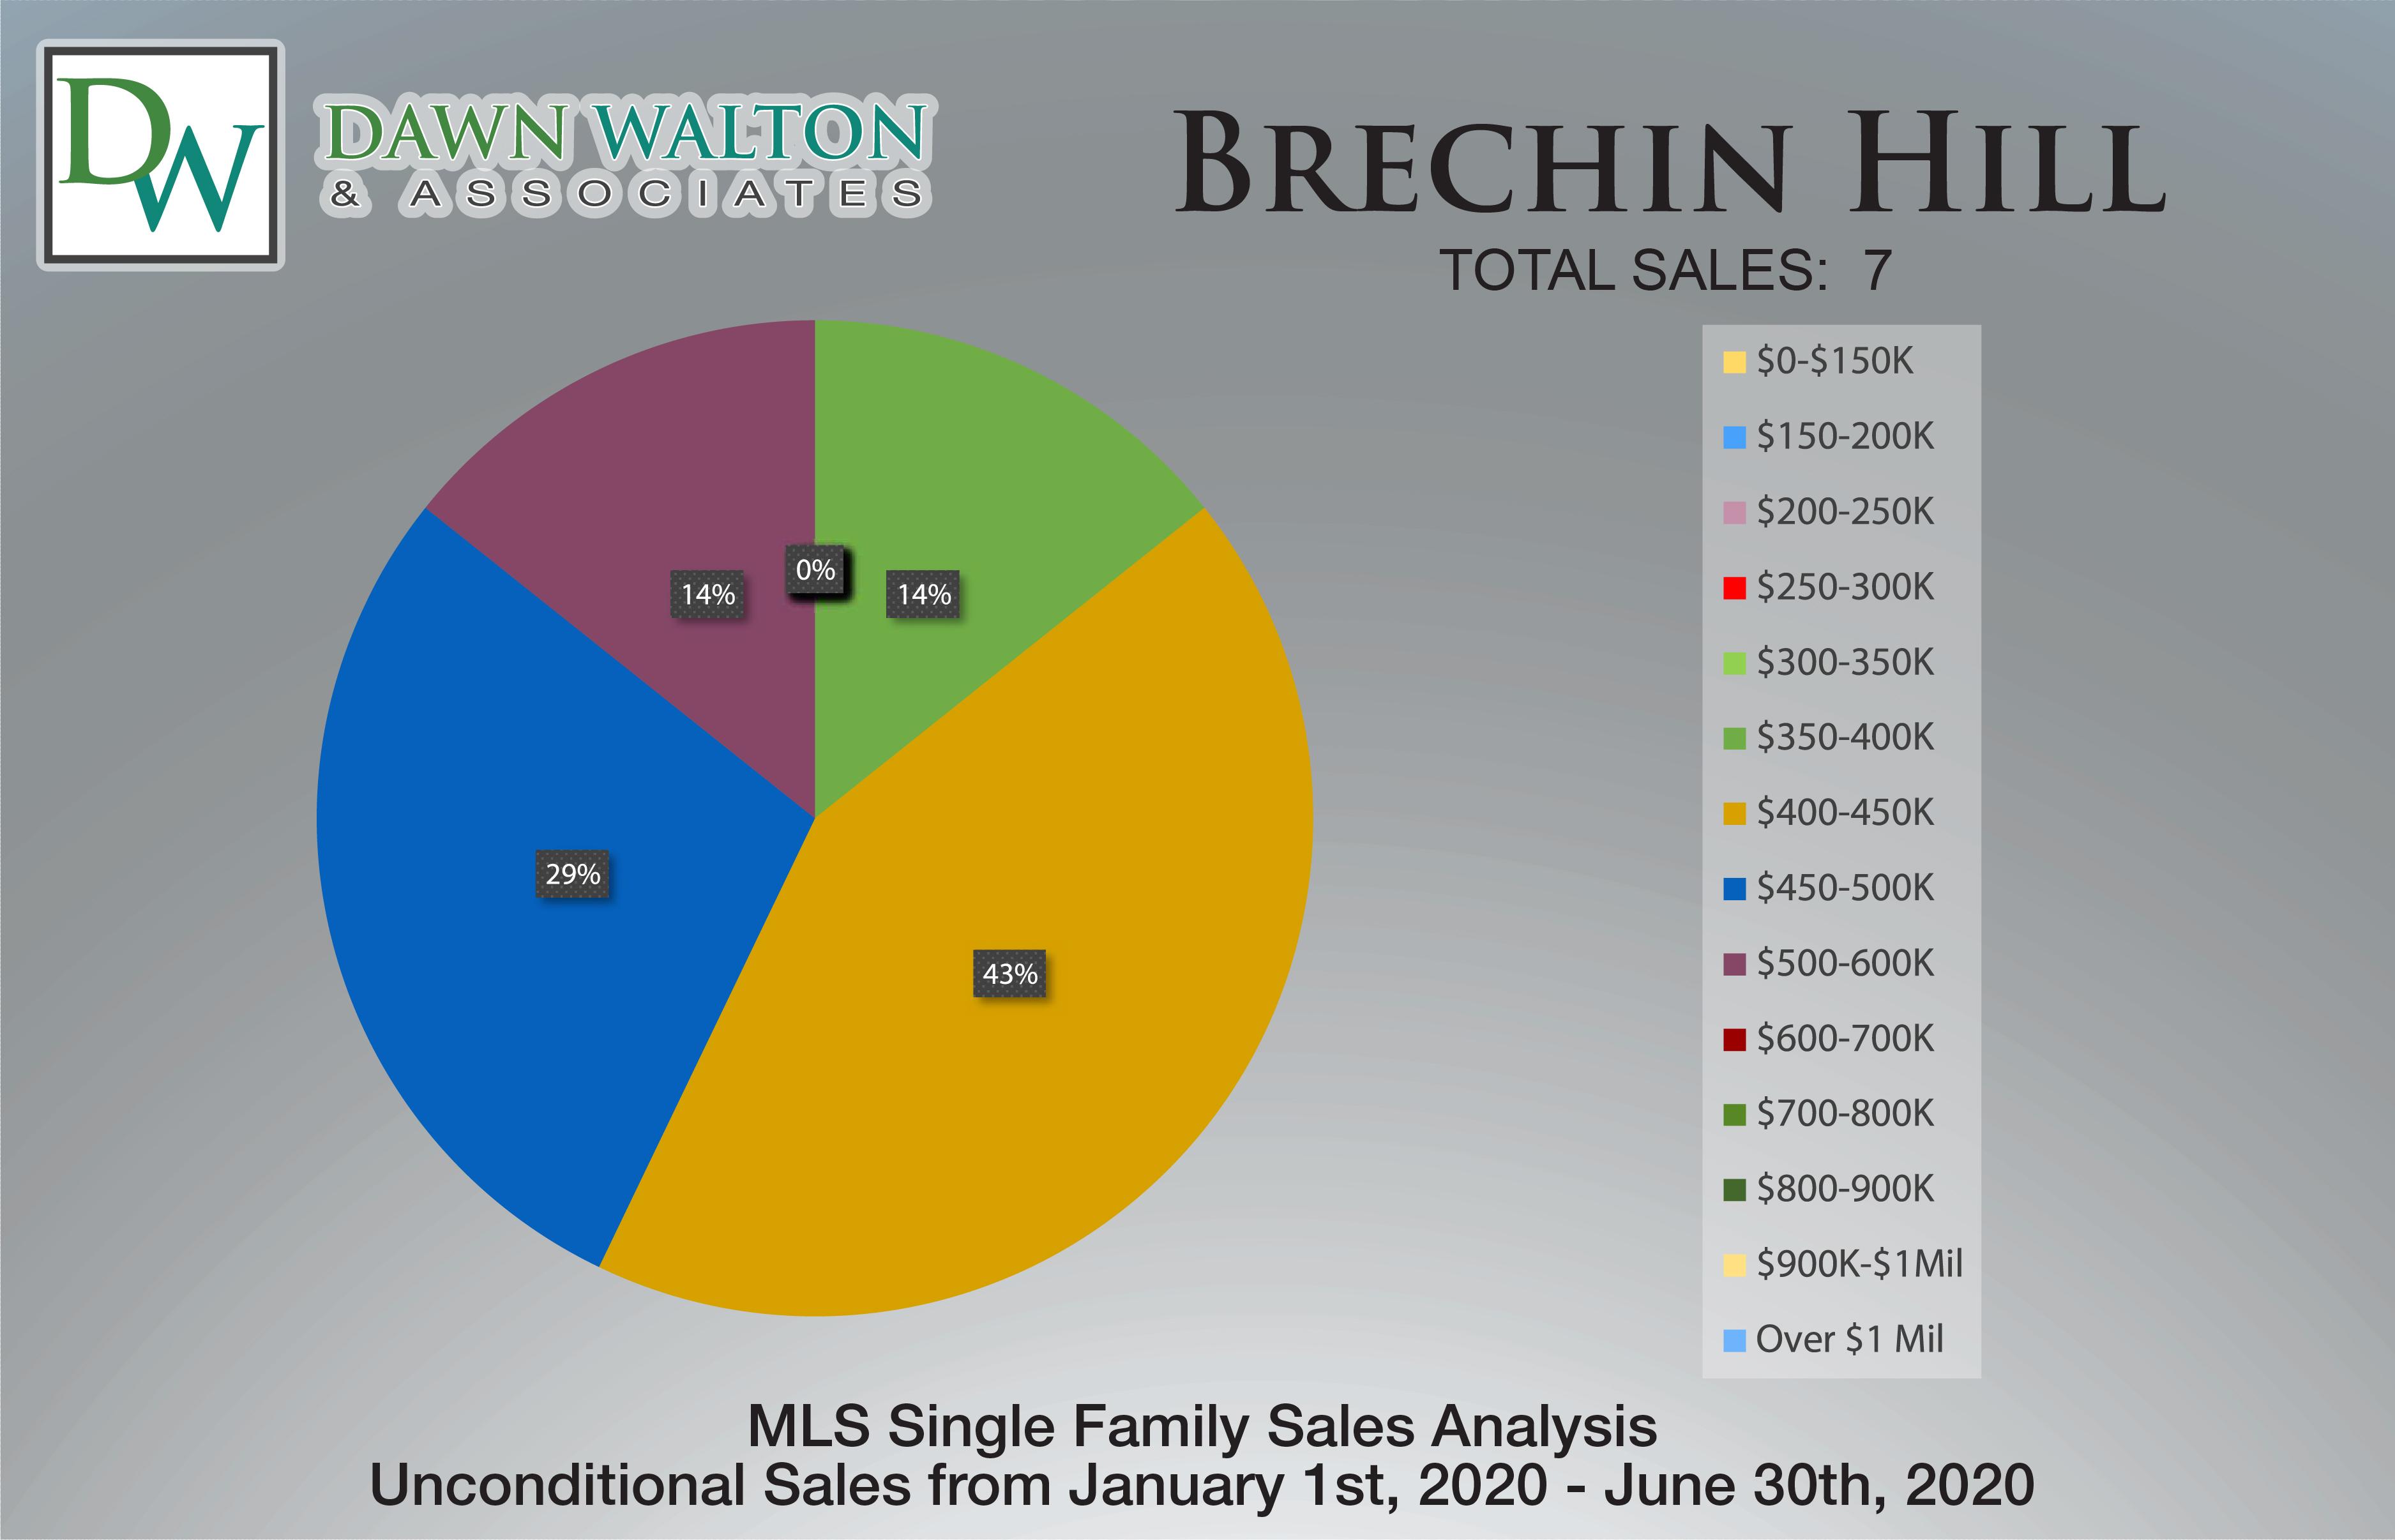 Brechin Hill Real Estate Market Stats Price Percentage Jan 1- June 30th  2020 - Nanaimo Realtor Dawn Walton